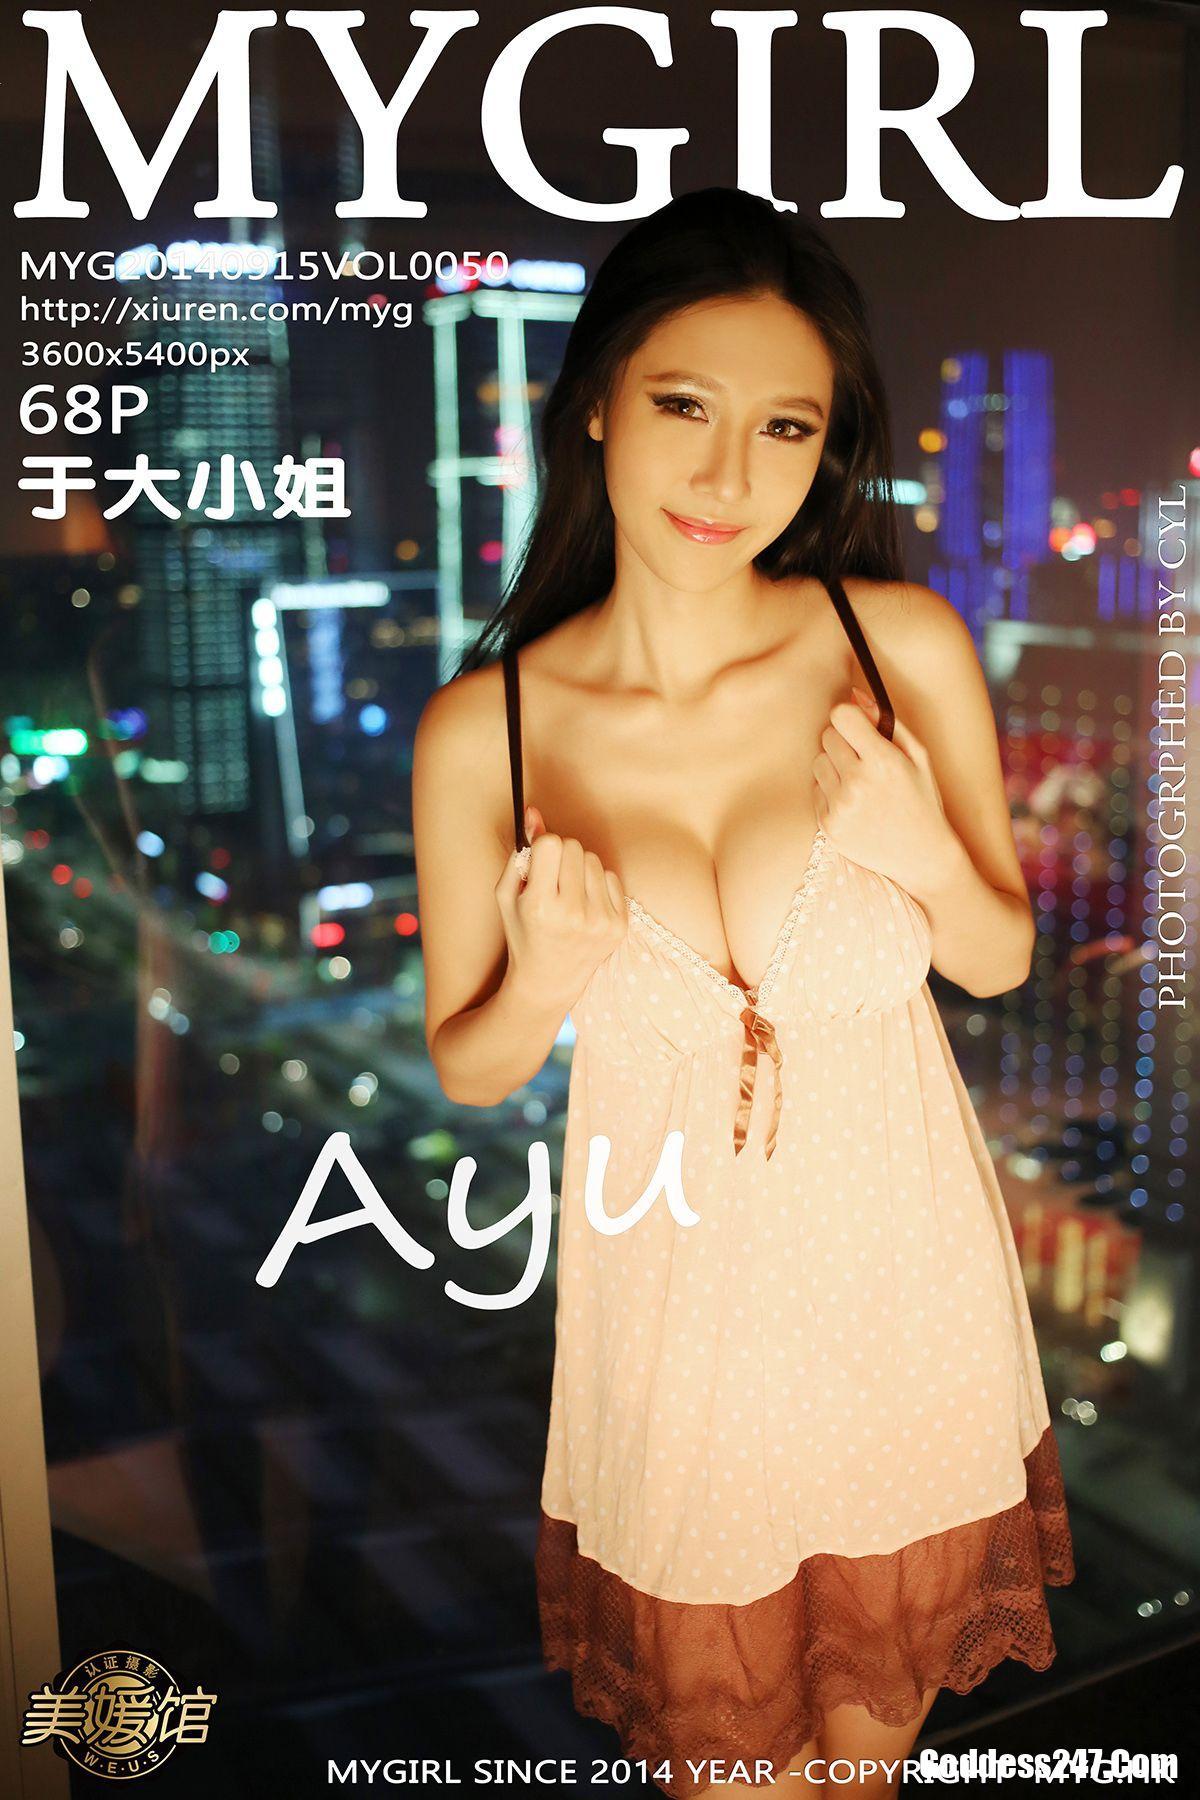 MyGirl Vol.050 于大小姐AYU